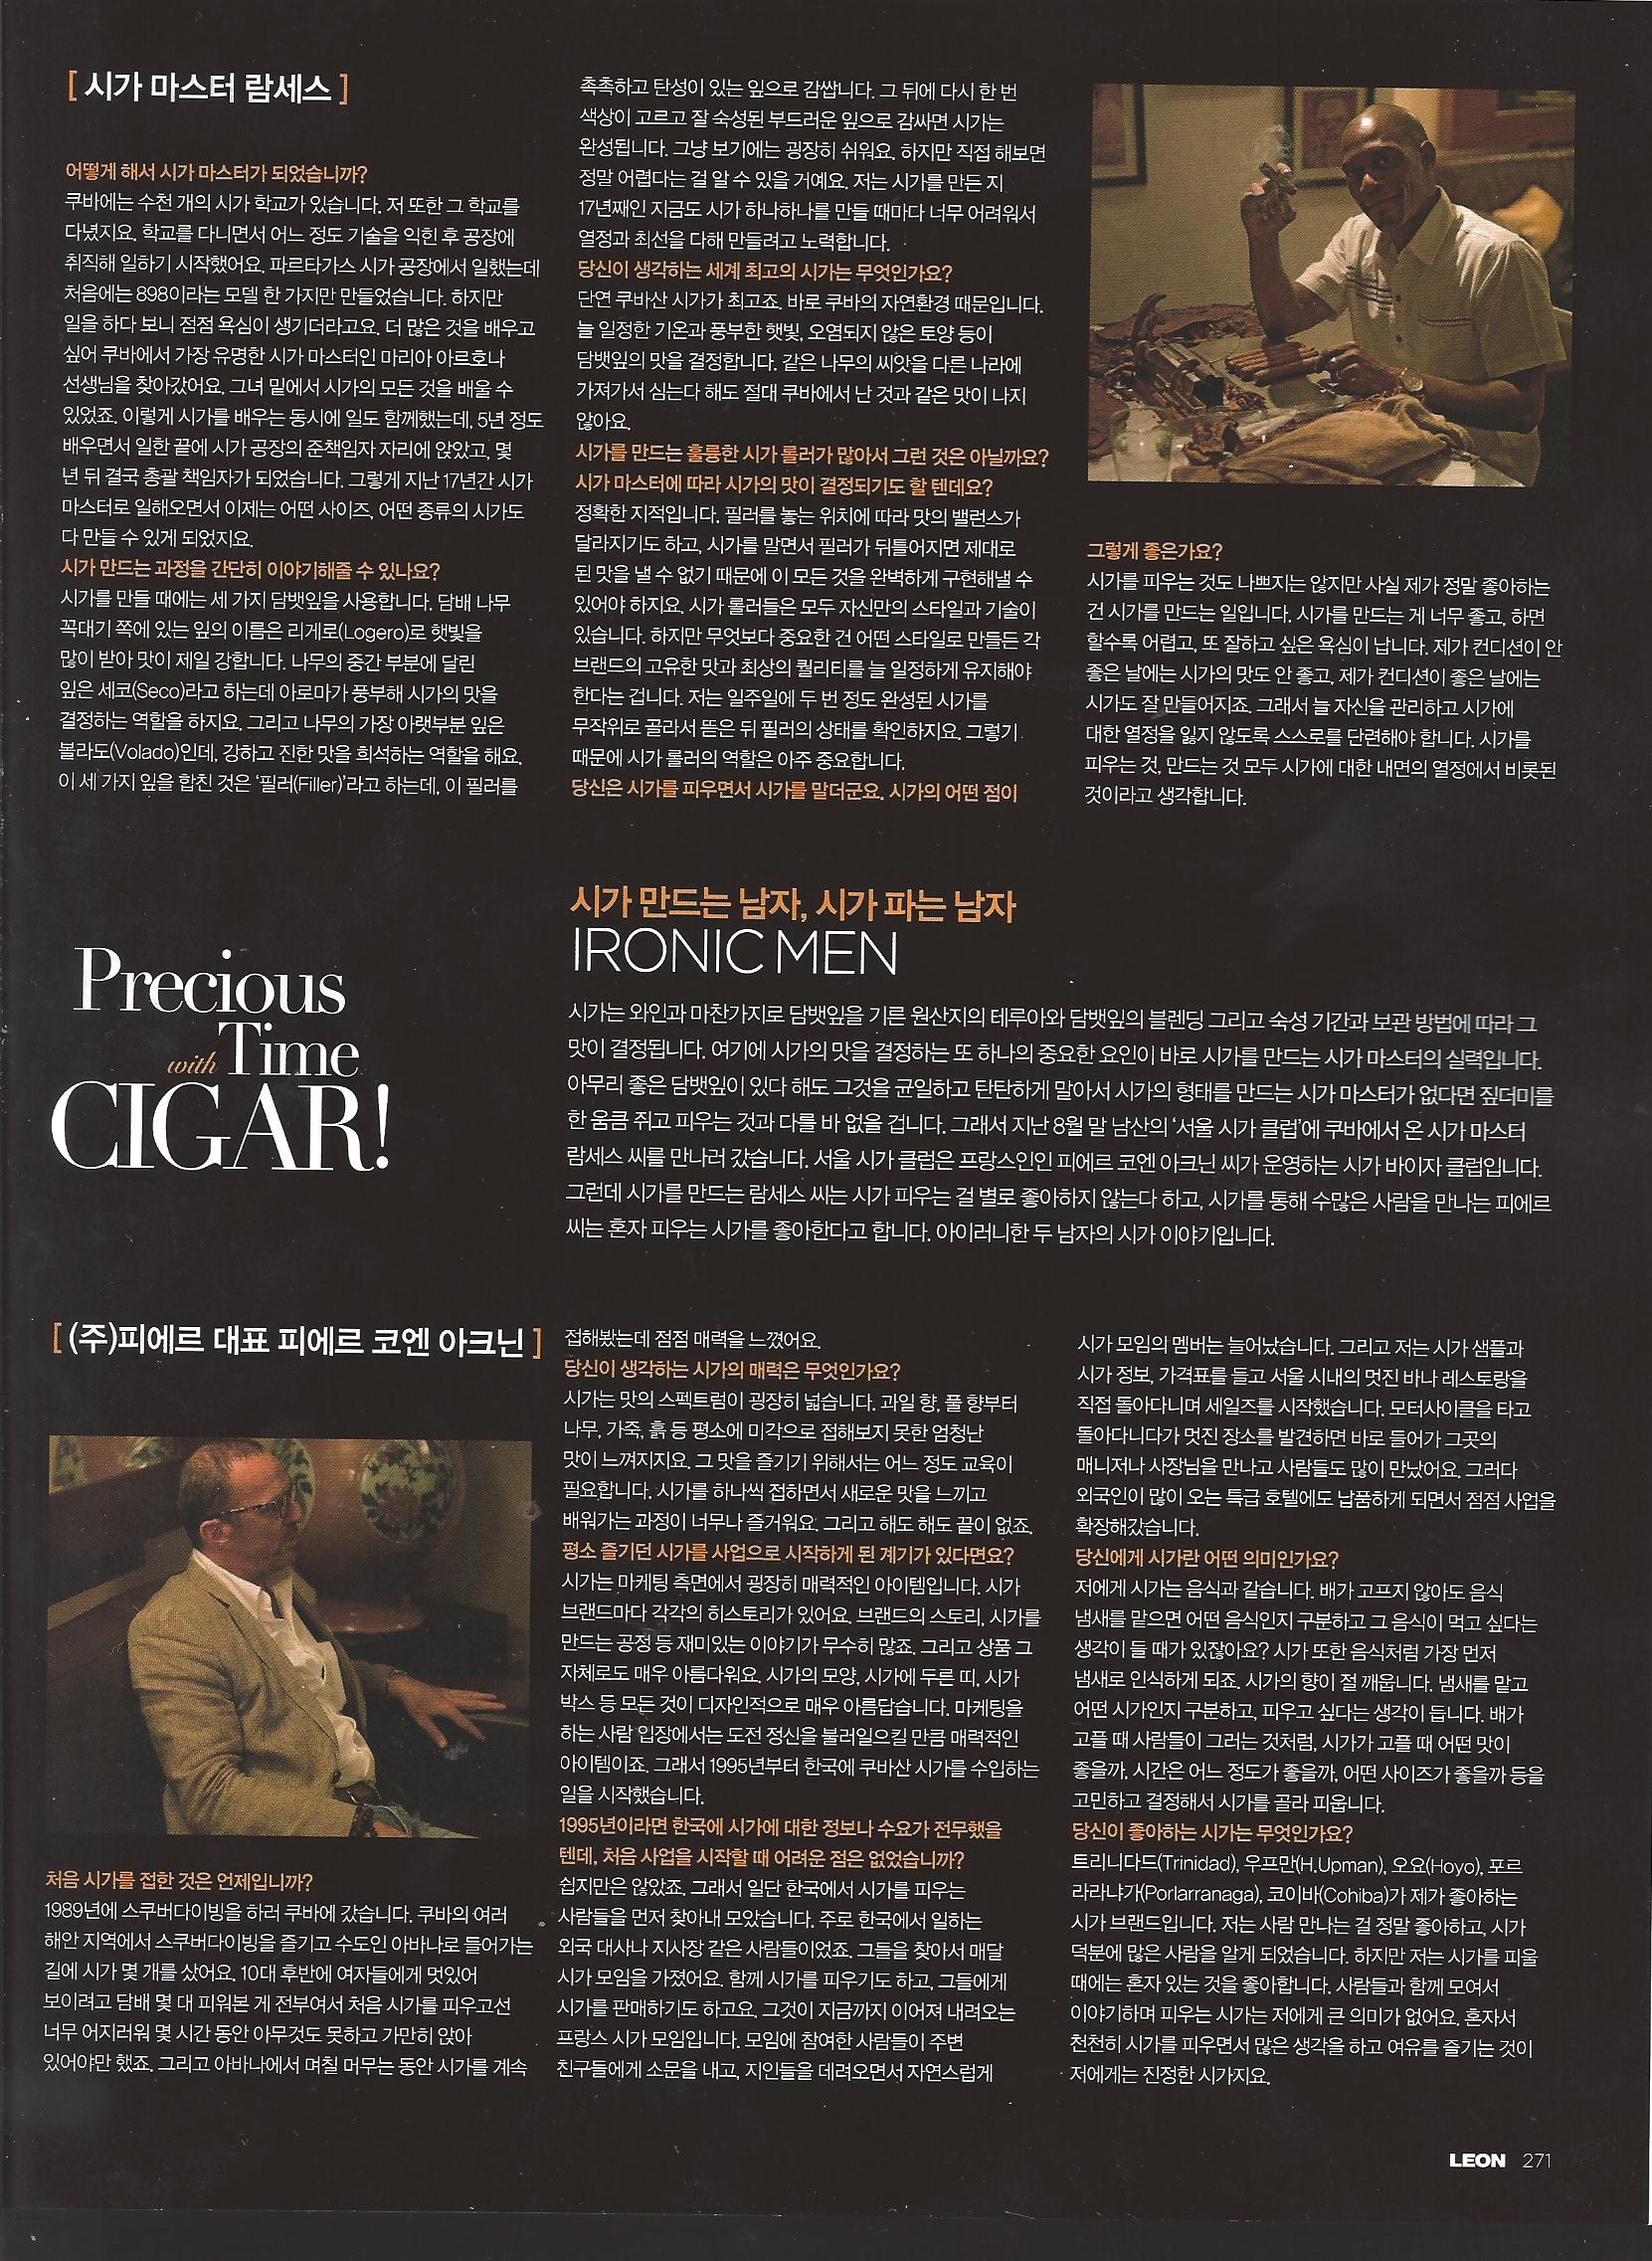 2012-10 Leon article 4.jpg